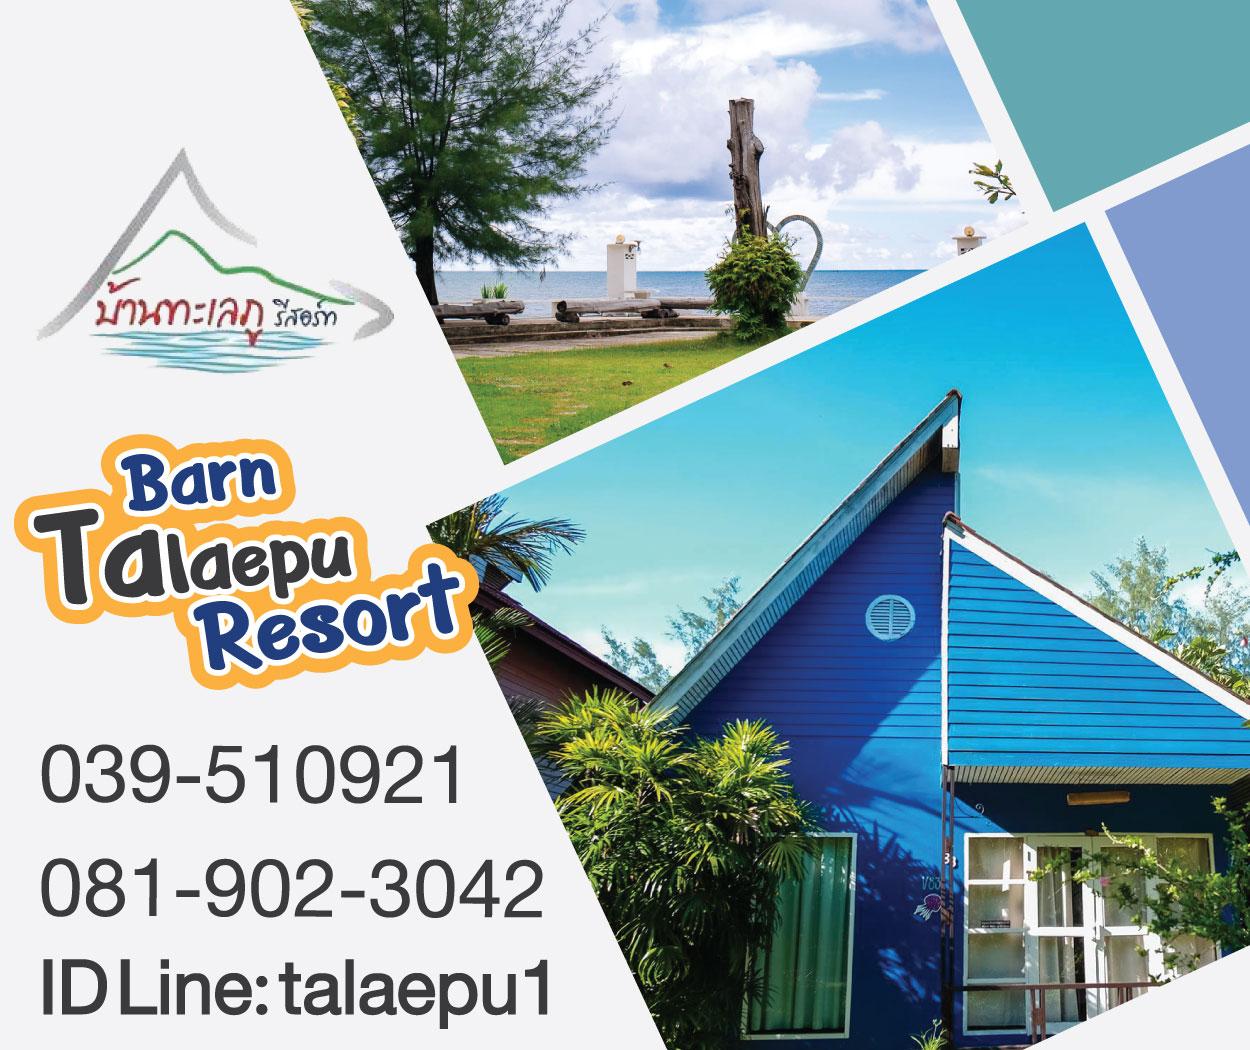 Barn Talaepu Resort